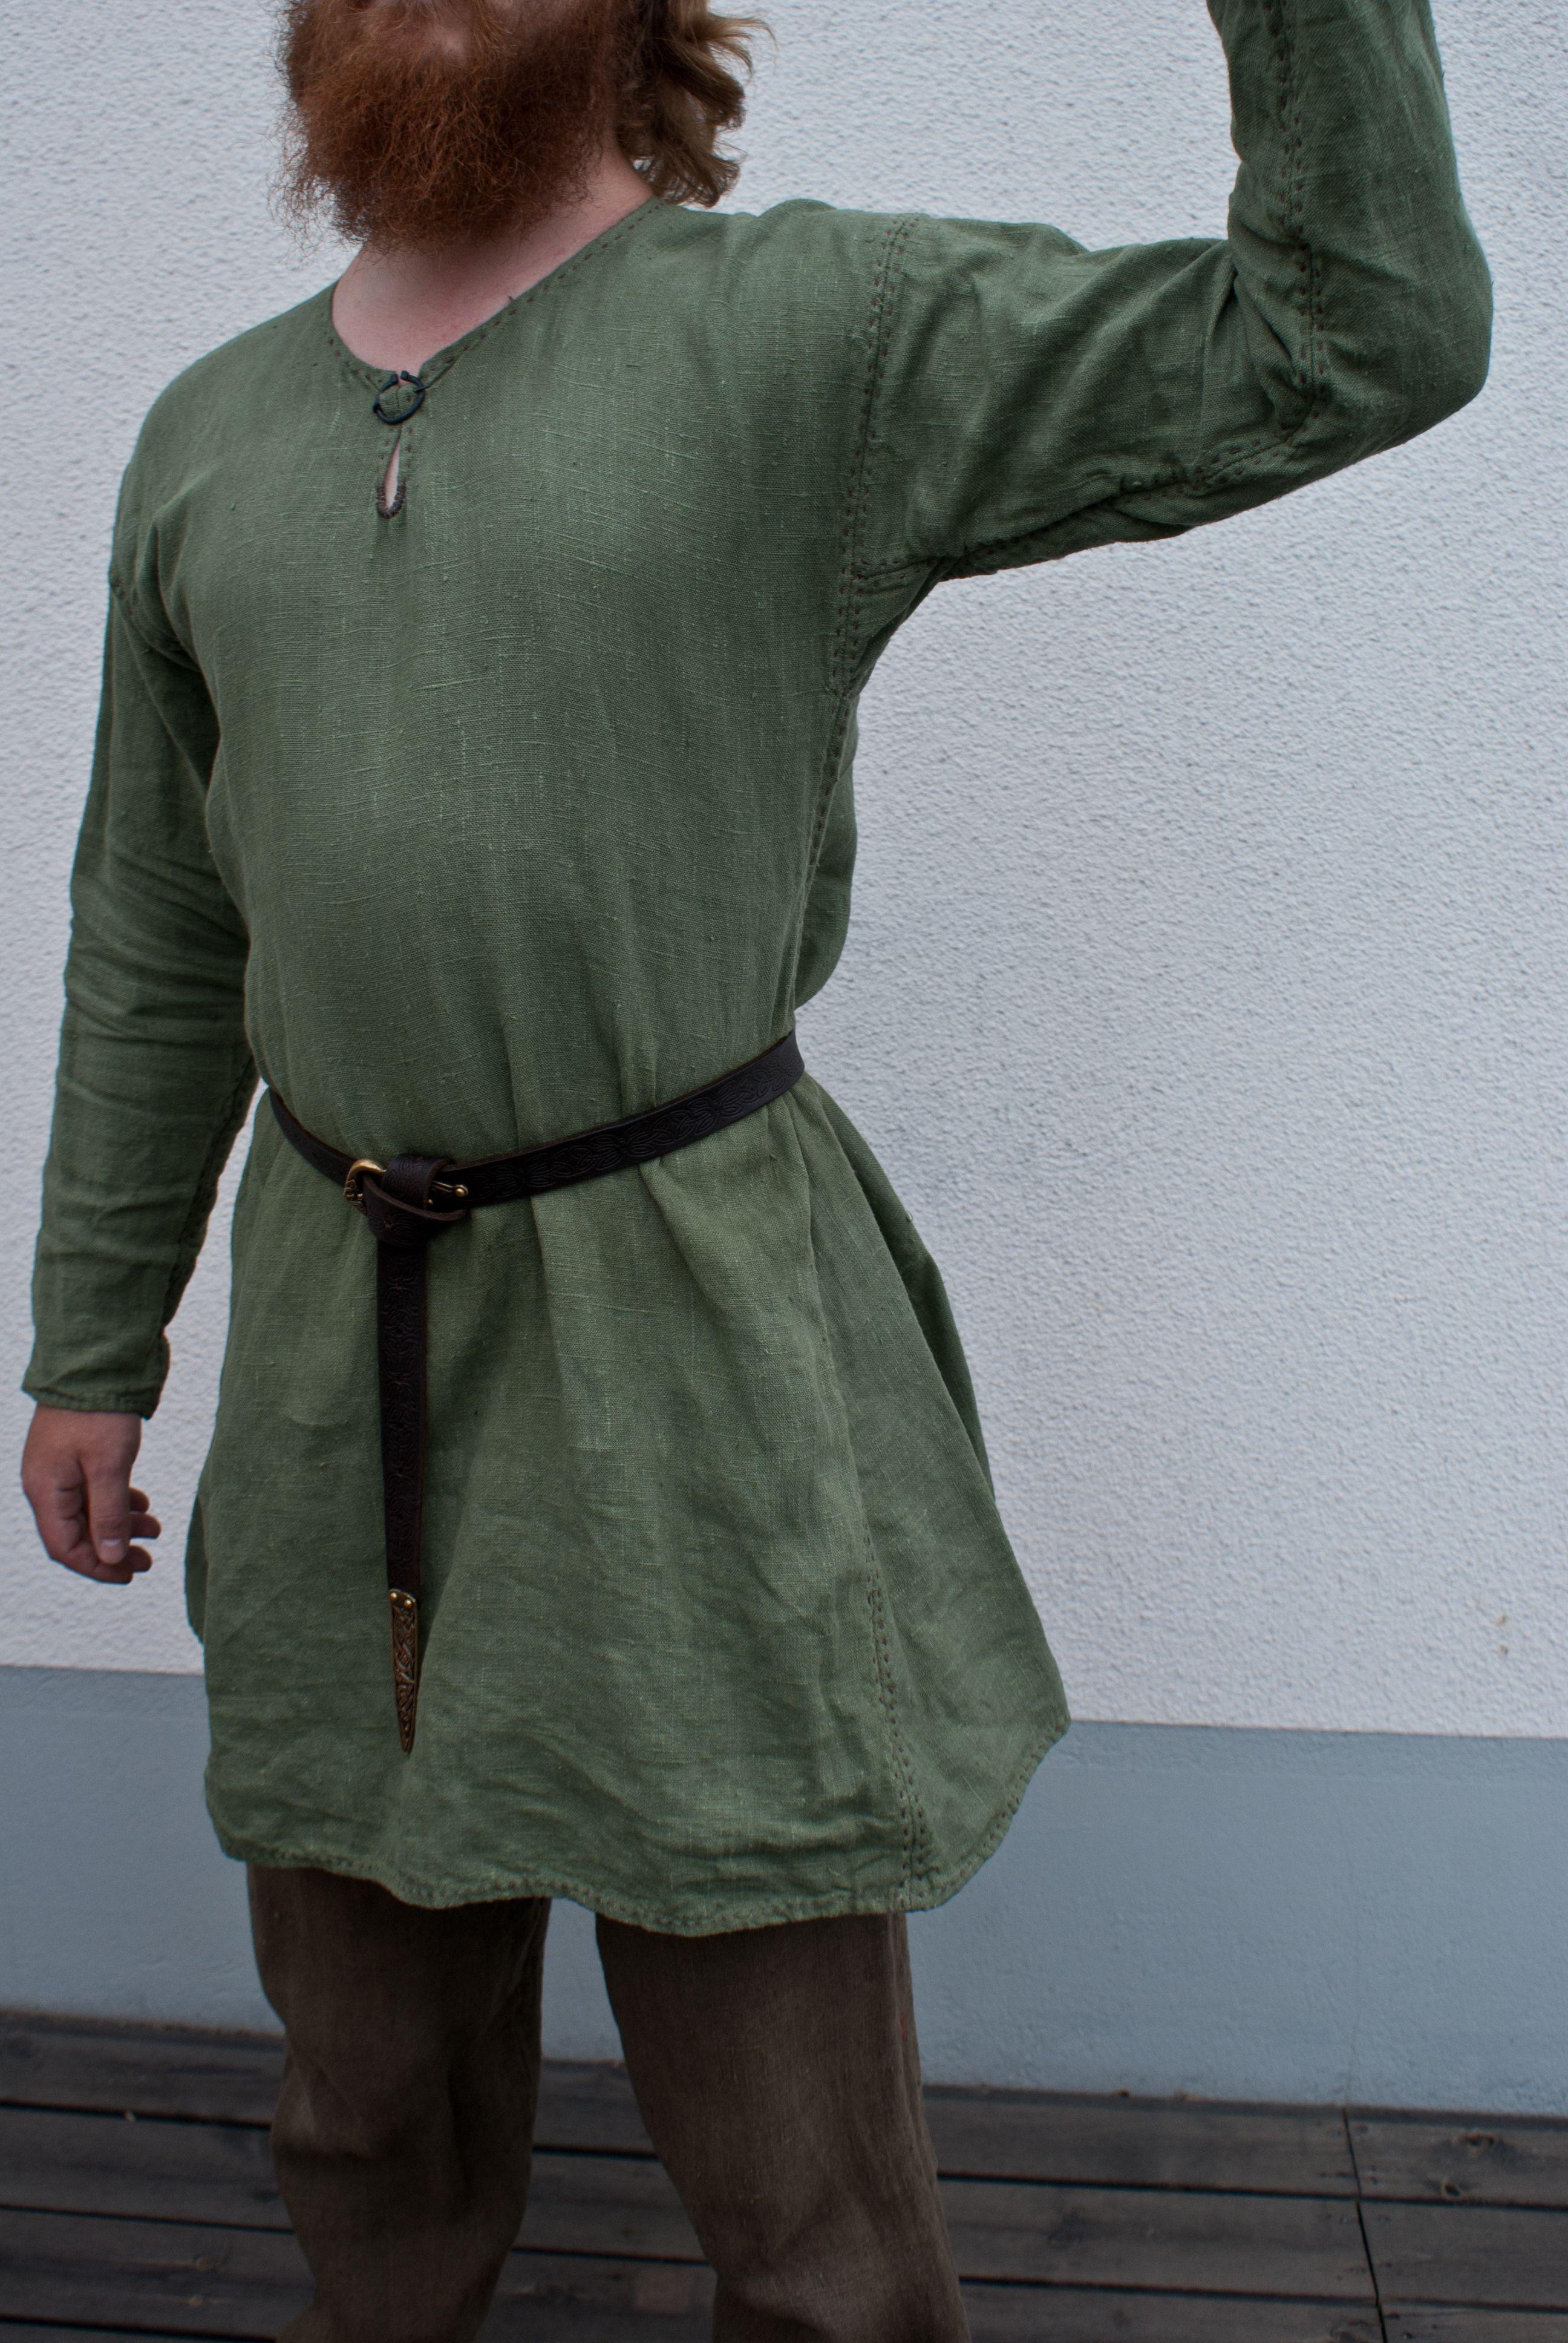 Hand sewn viking age linen tunic by Henrik Nordholm  https://www.facebook.com/pages/Henrik-Nordholm/254634504677319